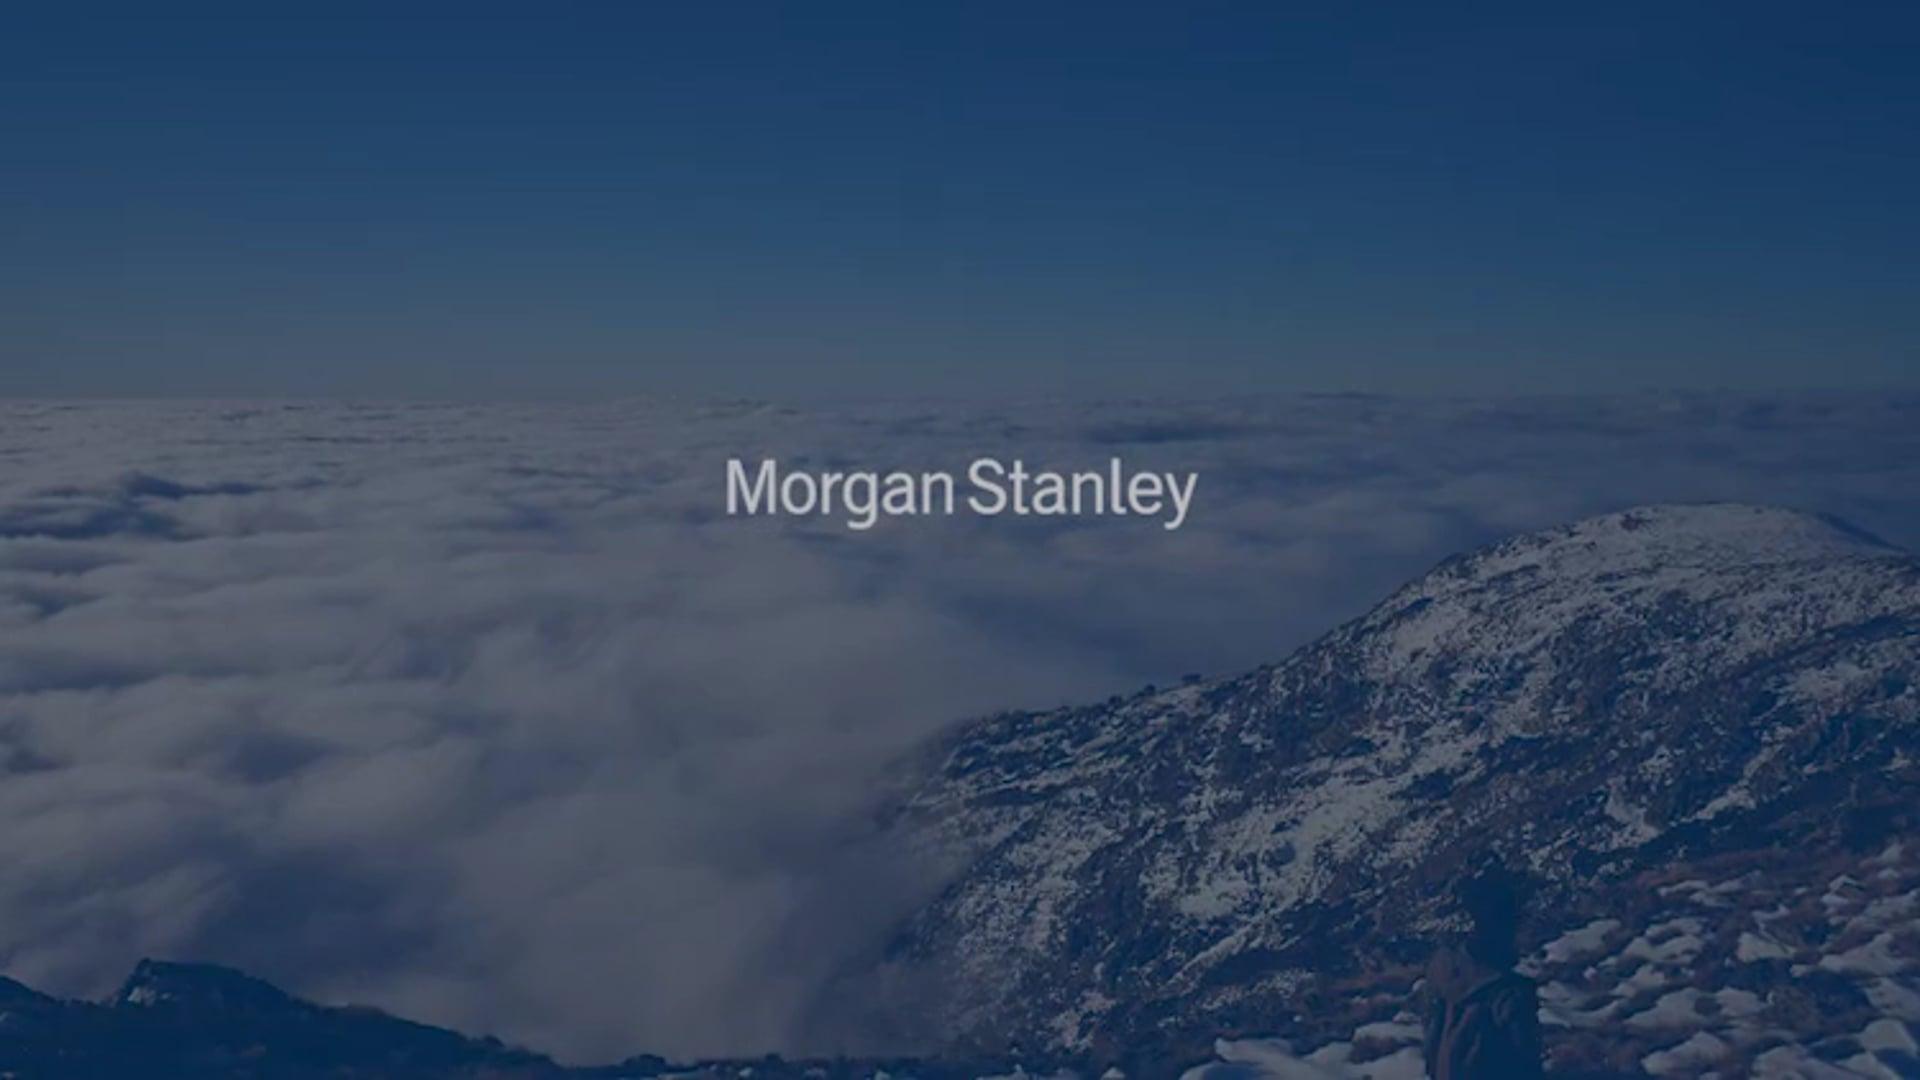 Morgan Stanley Corporate Video